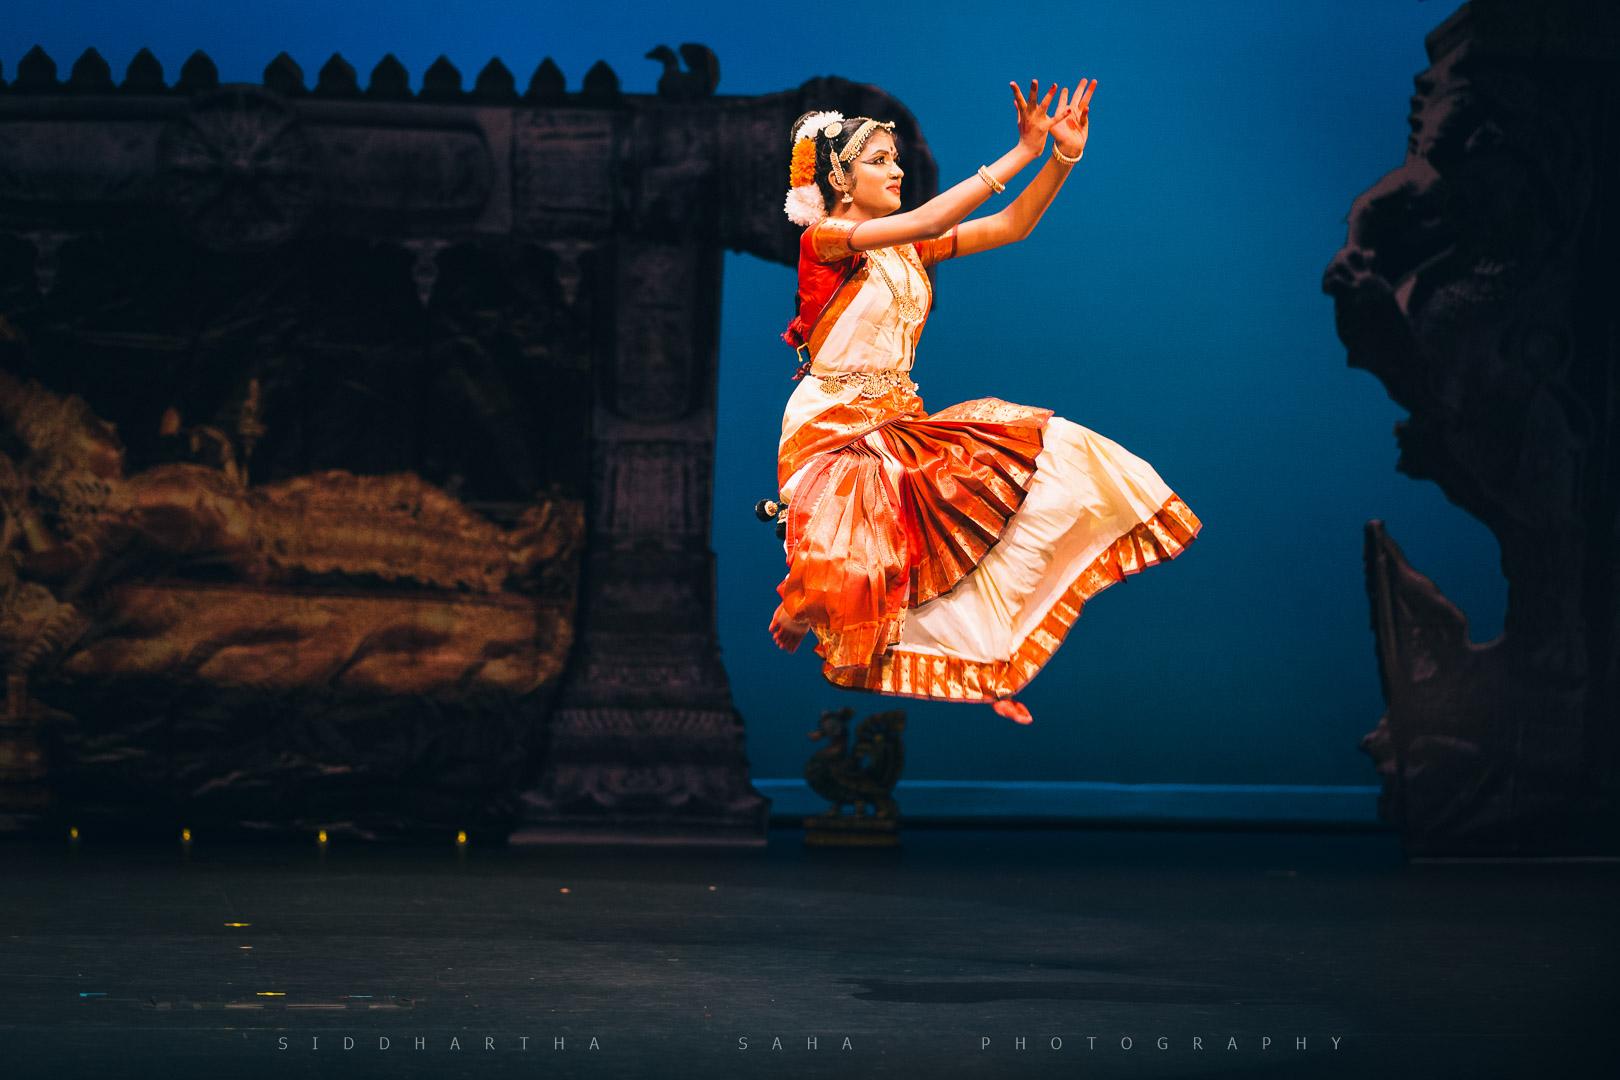 2015-07-25 - Kamaniya's Arangetram - _05Y5625